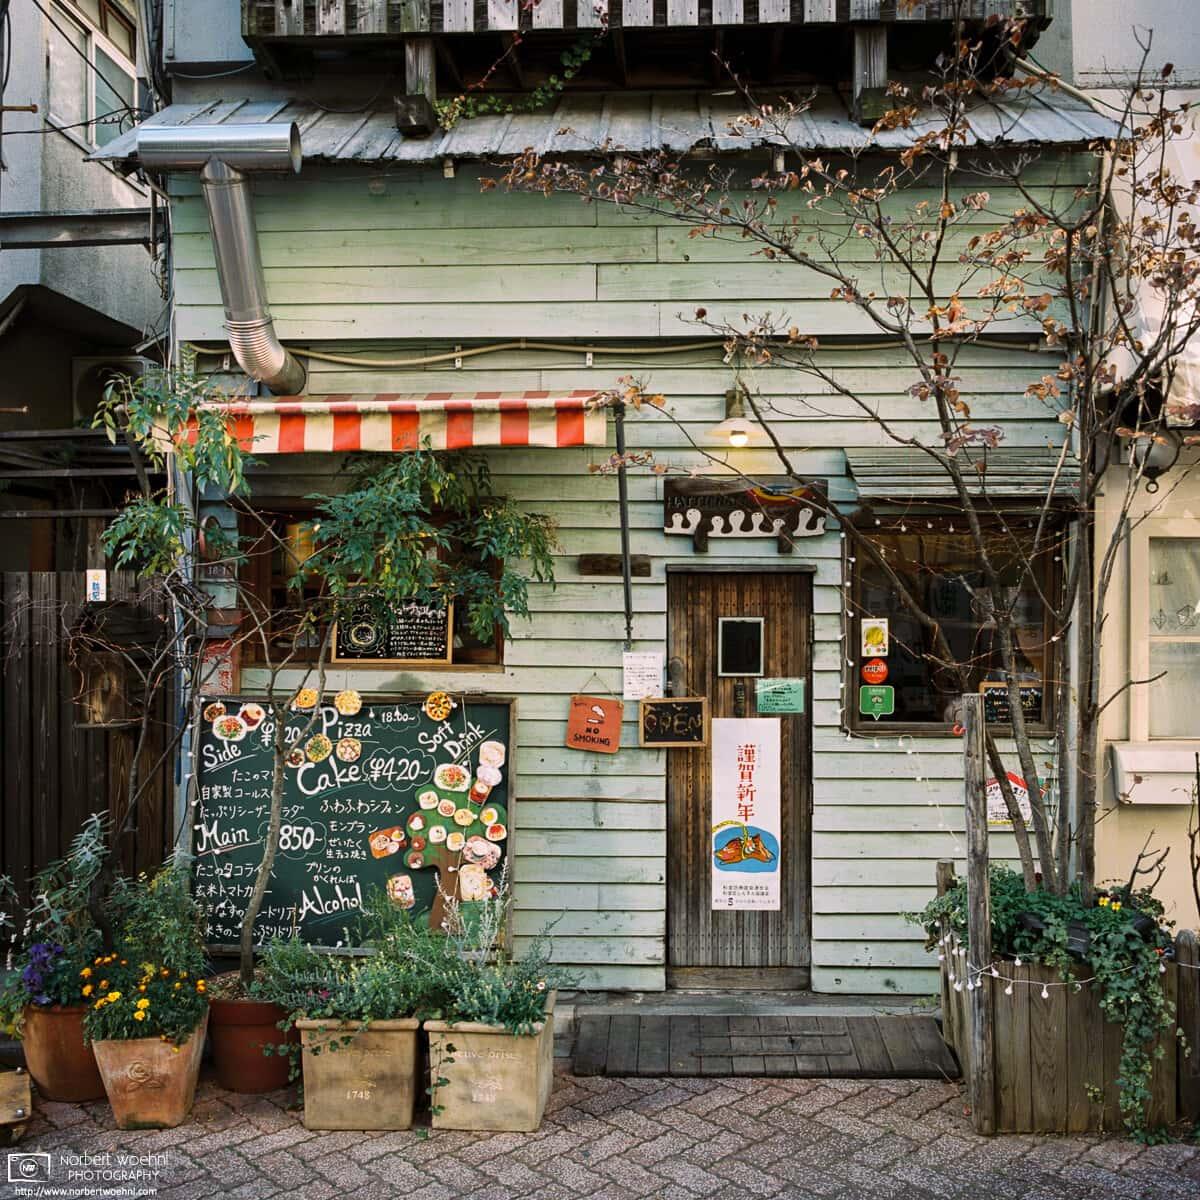 An exterior view of the HATTIFNATT café and gallery in Kōenji, Tokyo, Japan.